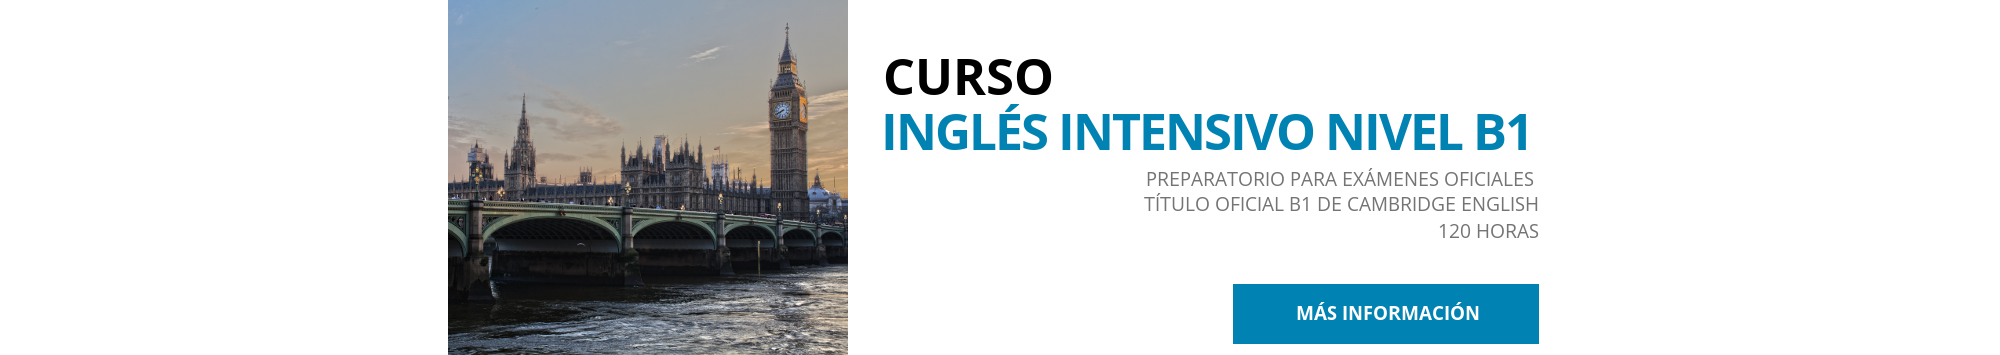 curso-ingles-1